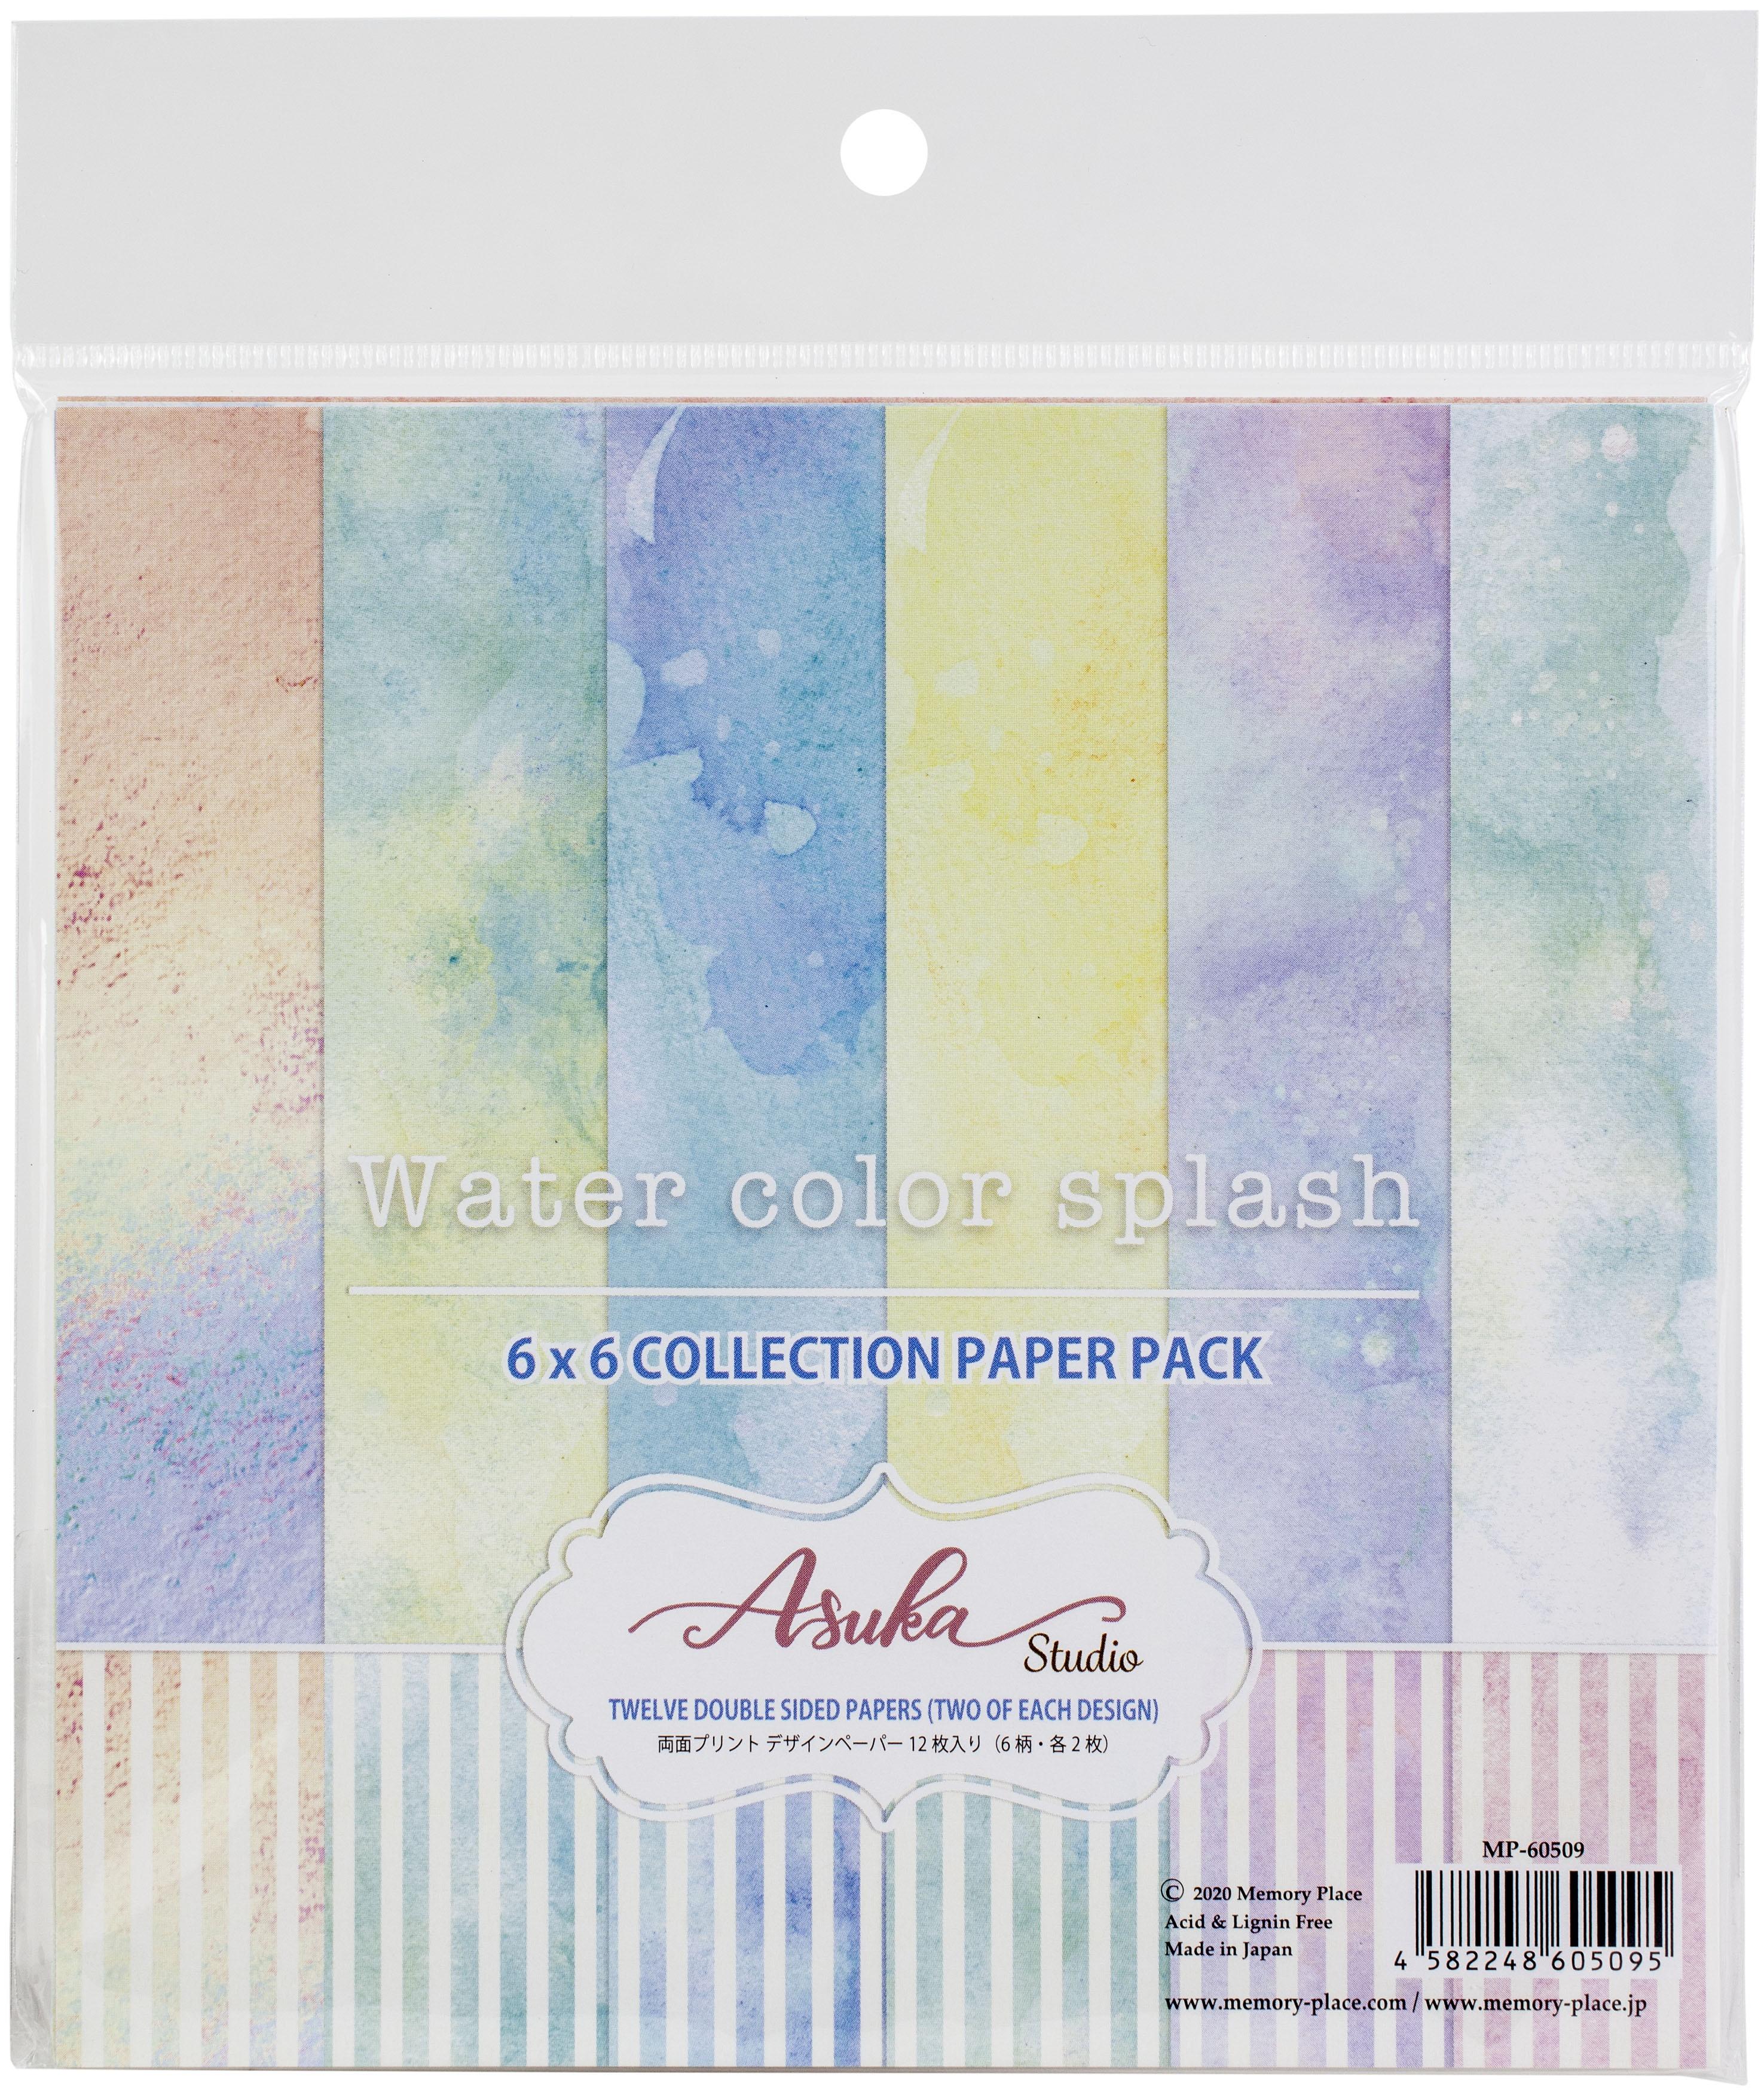 Asuka Studio Double-Sided Paper Pack 6X6 12/Pkg-Watercolor Splash